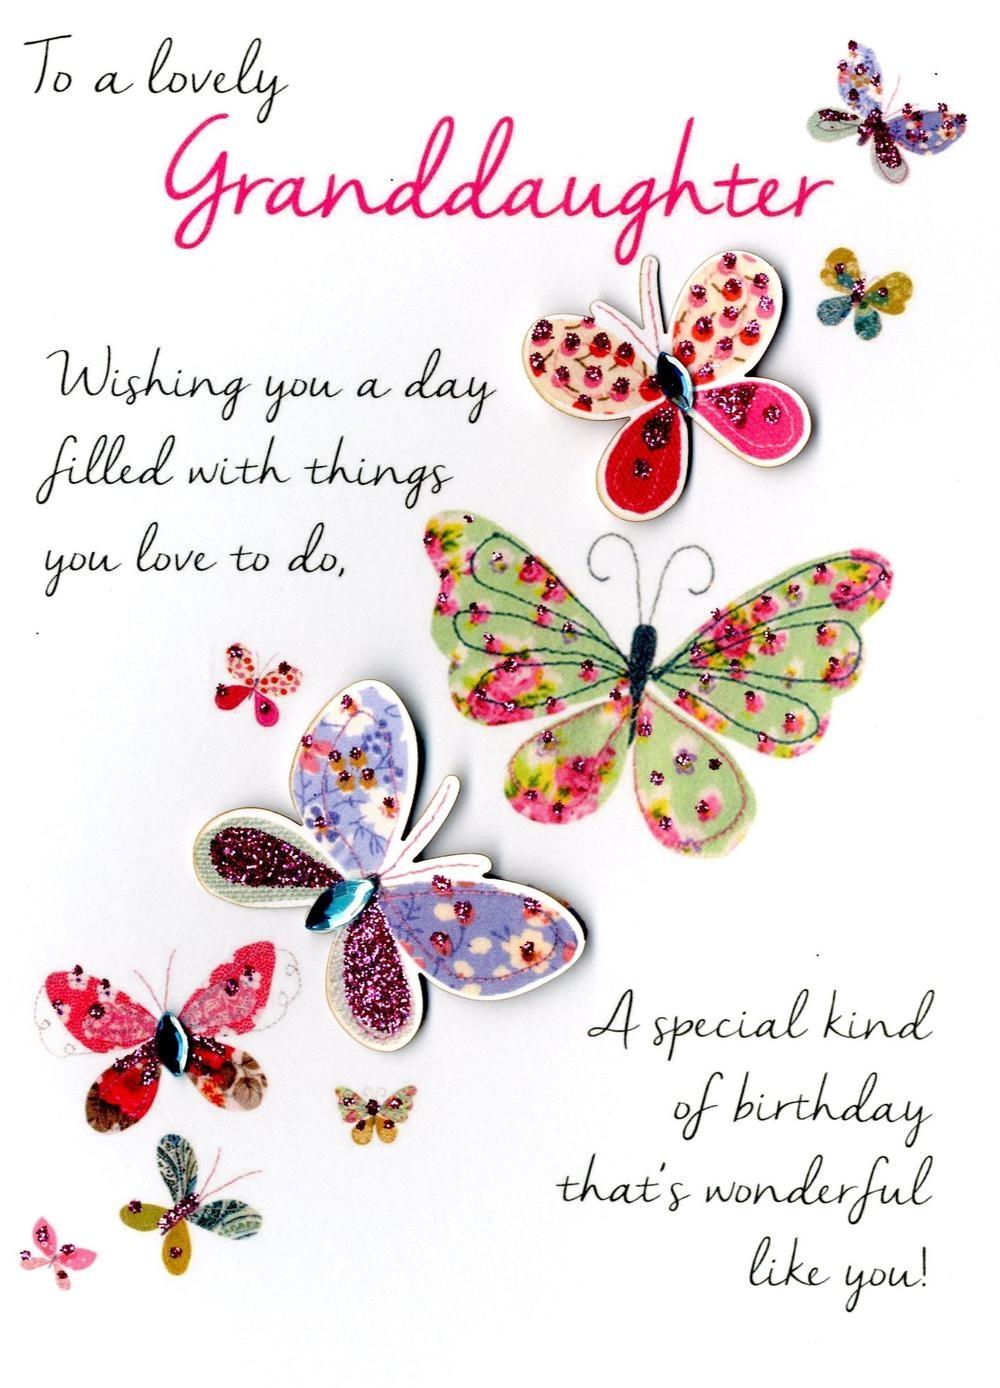 granddaughter birthday templates for creative card design